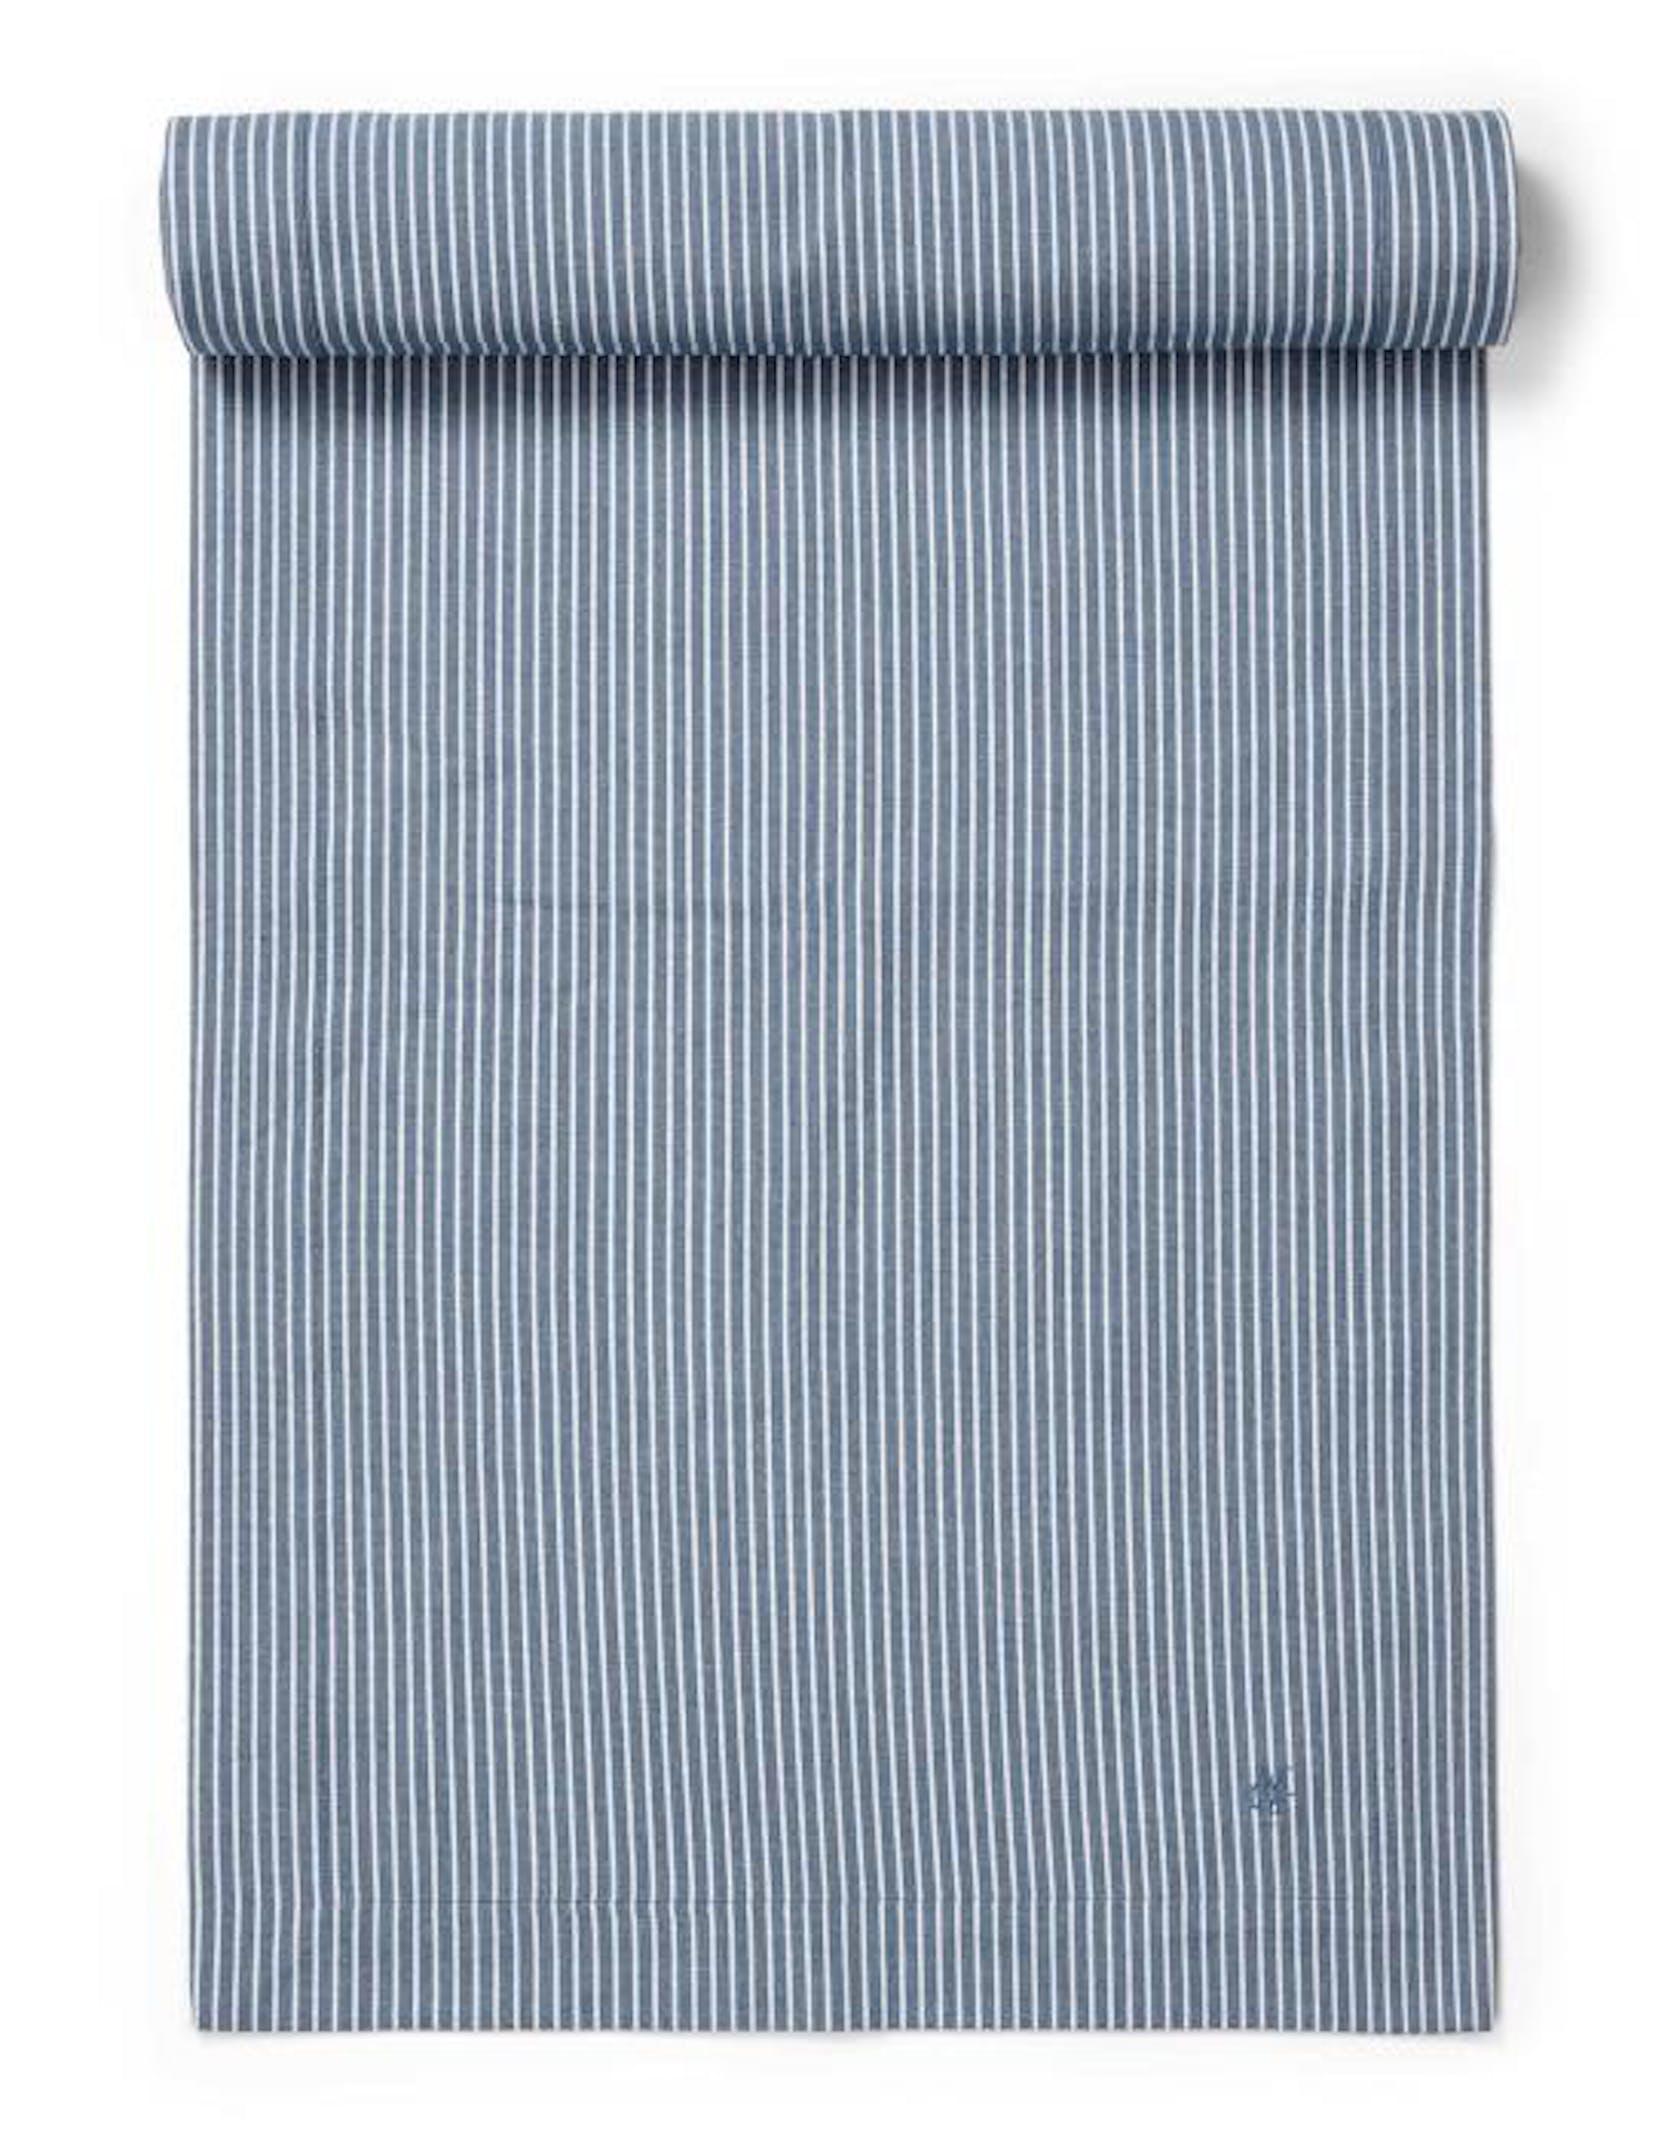 Marc O'Polo Tentstra Tischläufer Streifen Smoke Blue